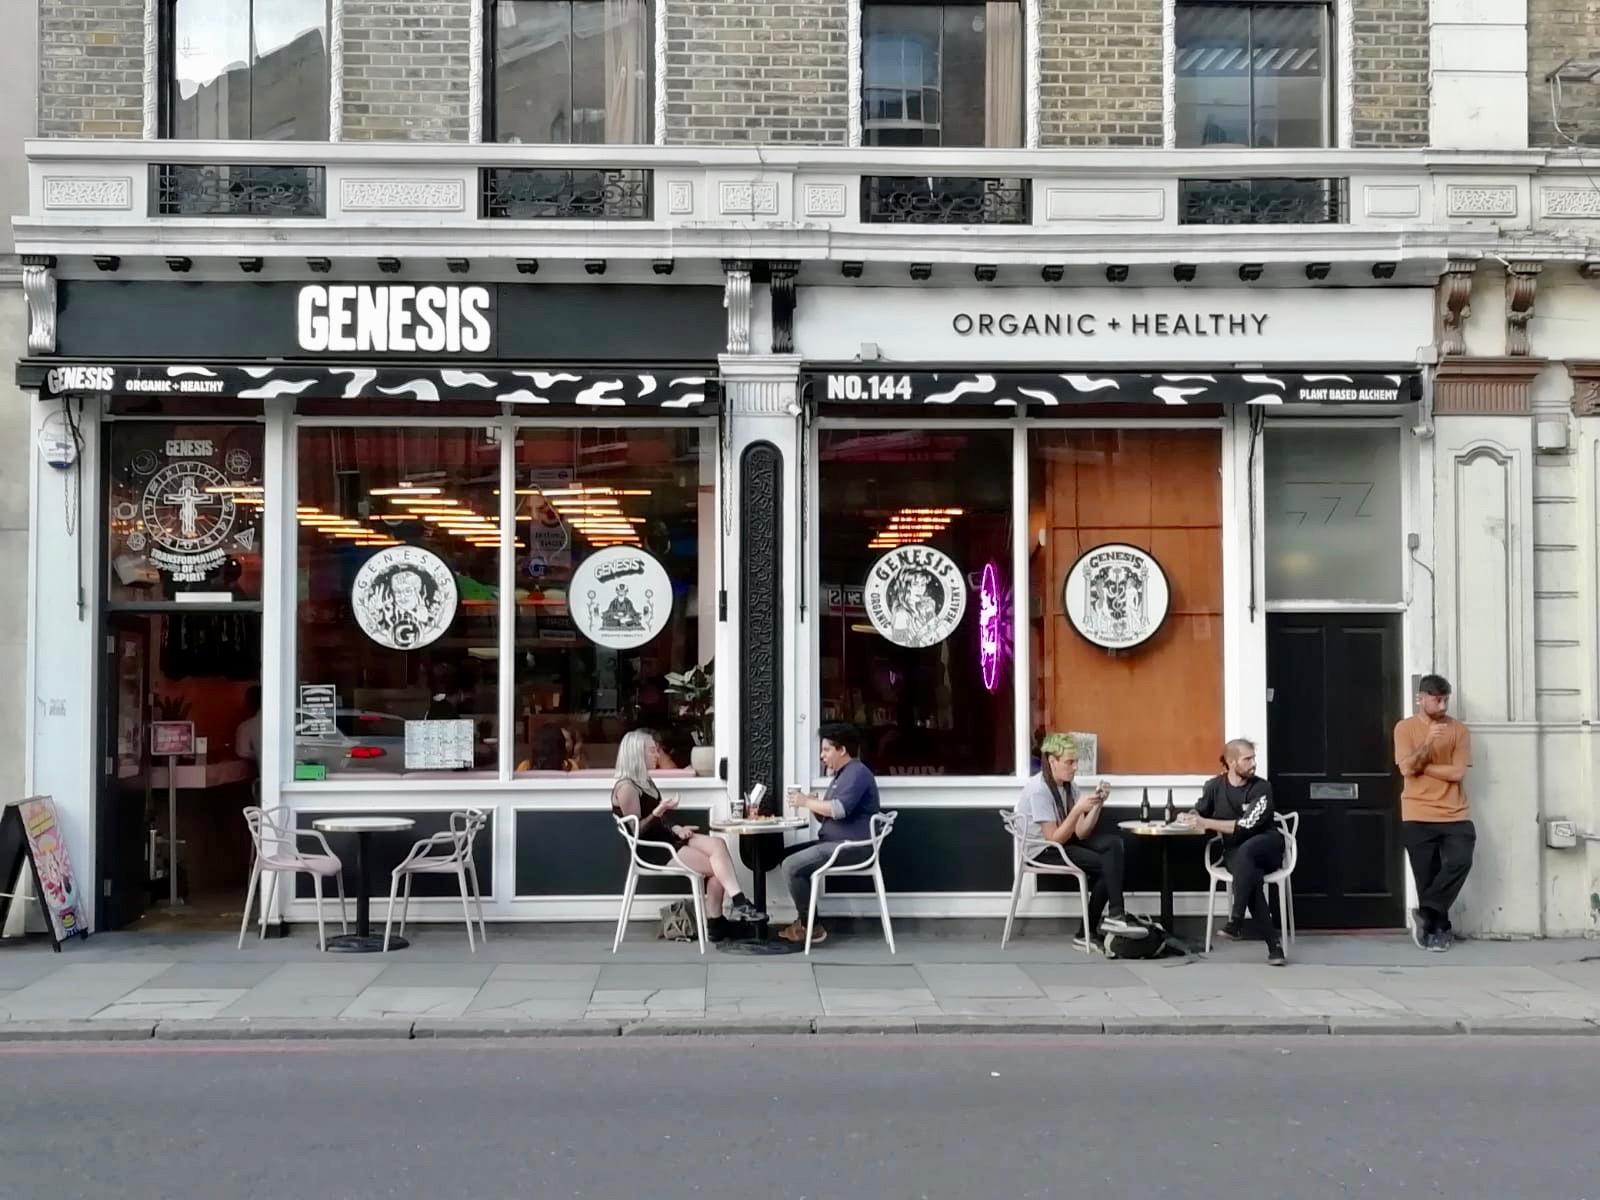 Outside of Genesis vegan restaurant in Shoreditch, London